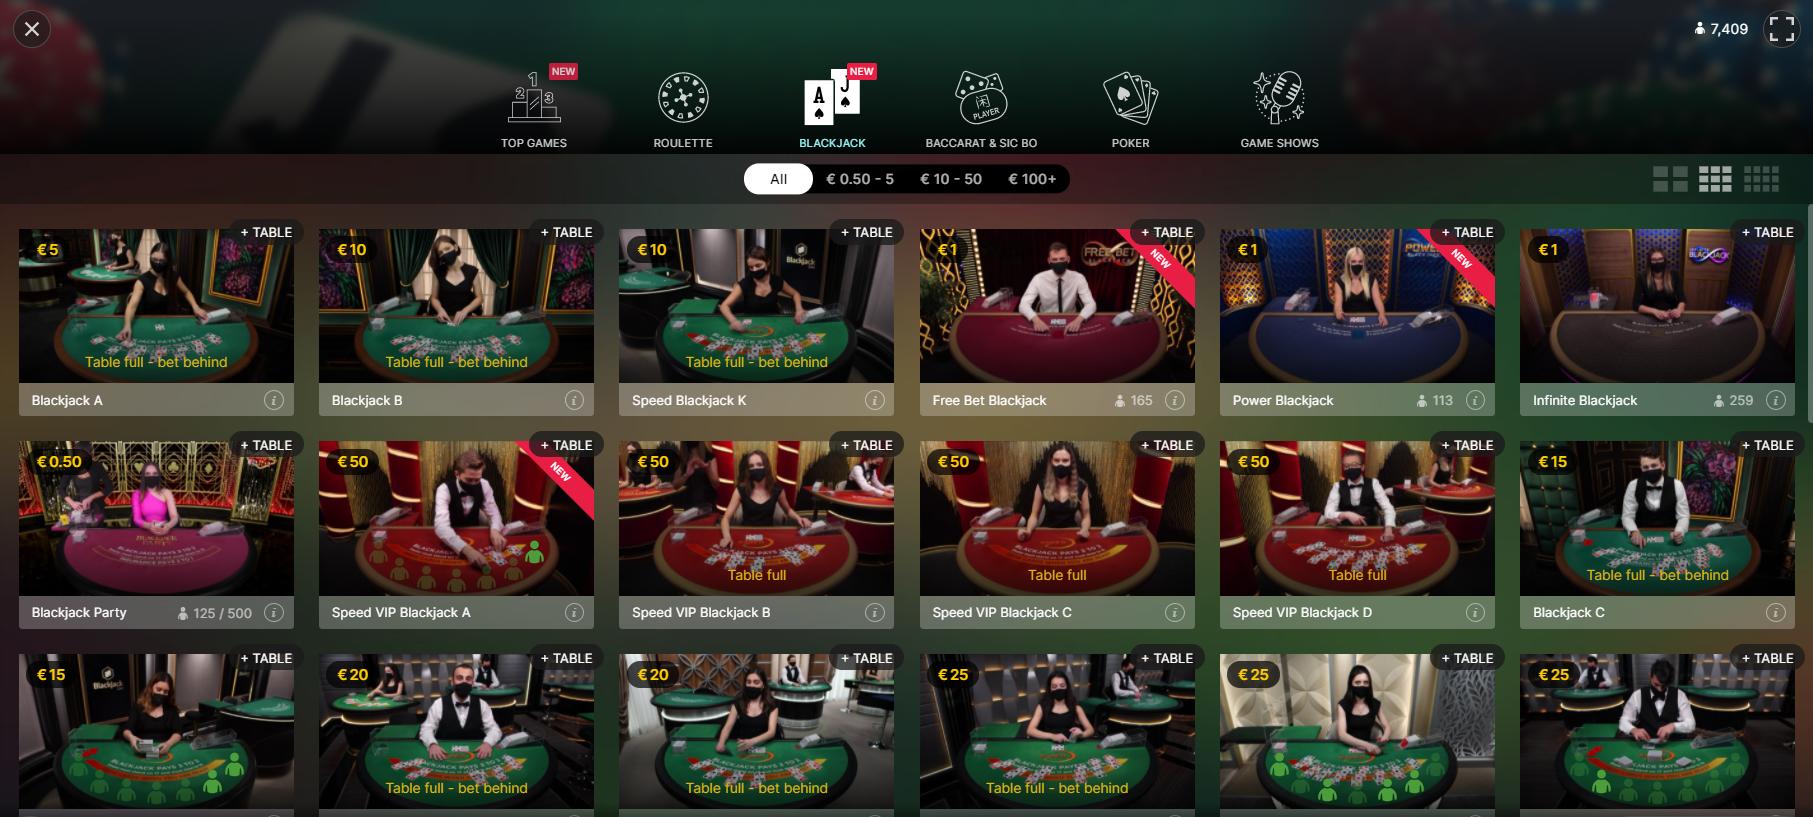 uniclub live kazino evolution gaming lobby blackjack ruletė pokeris baccarat